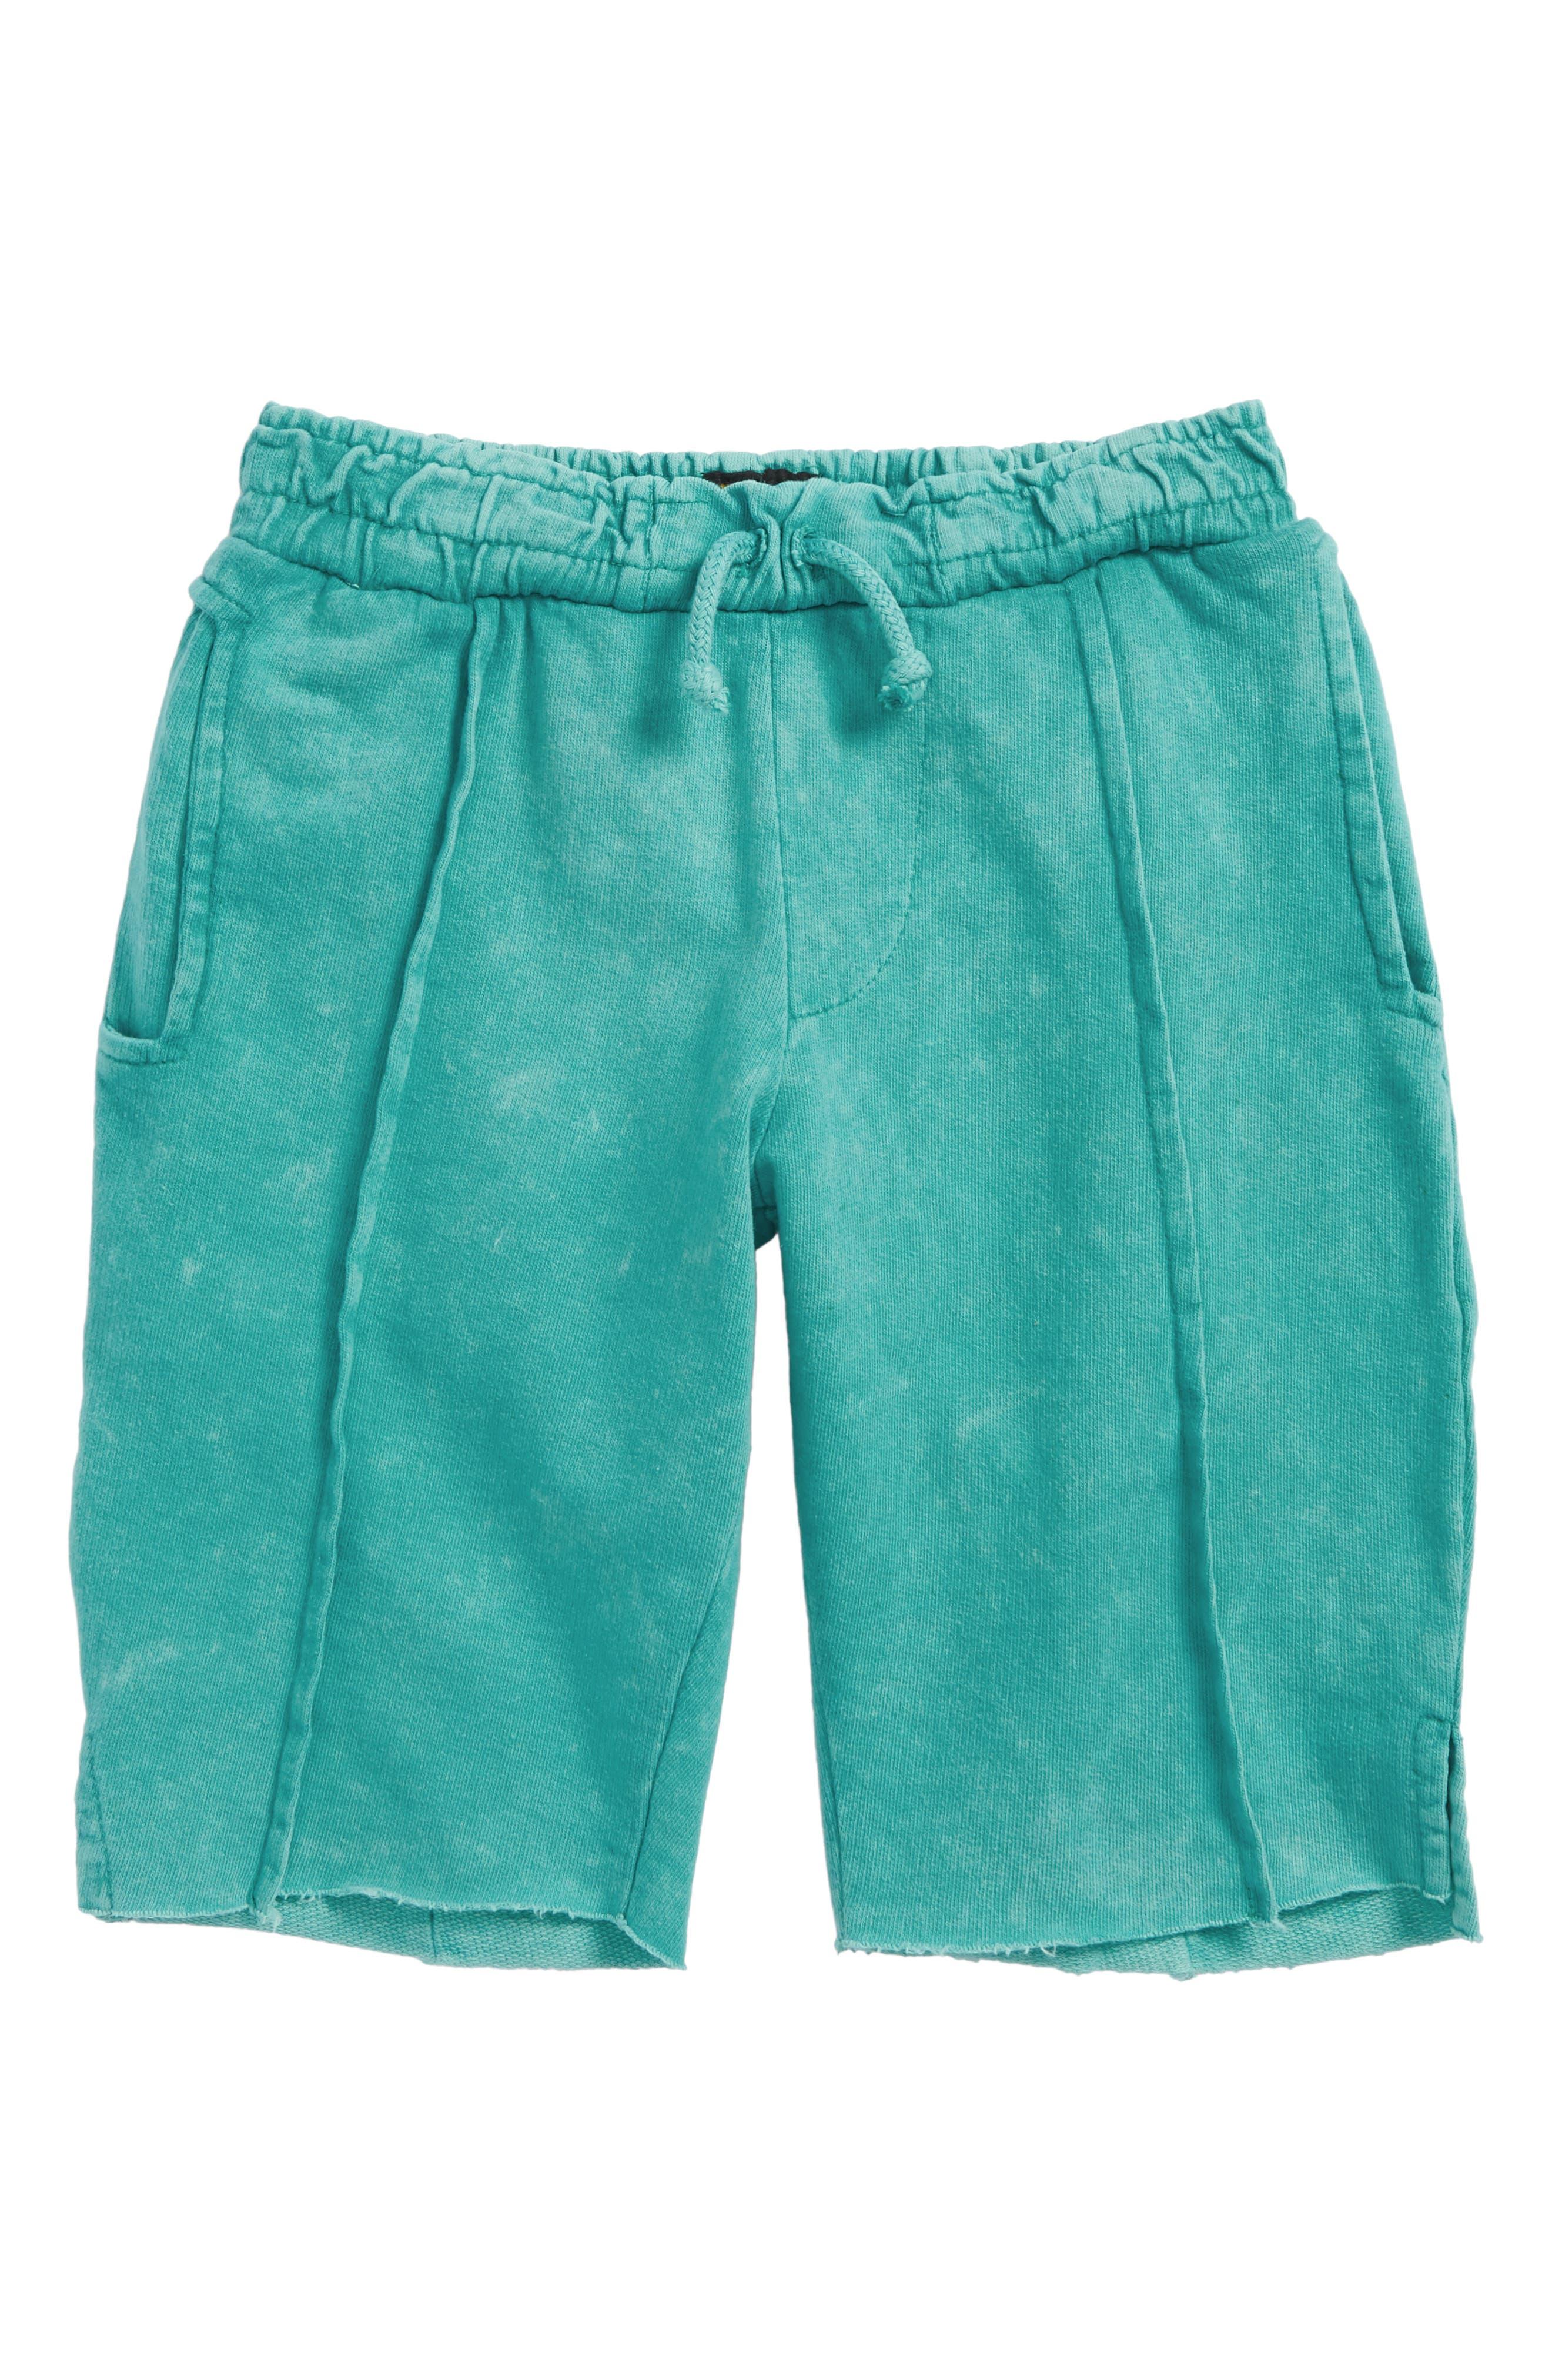 Main Image - Lee Acid Wash Pull-On Shorts (Toddler Boys & Little Boys)